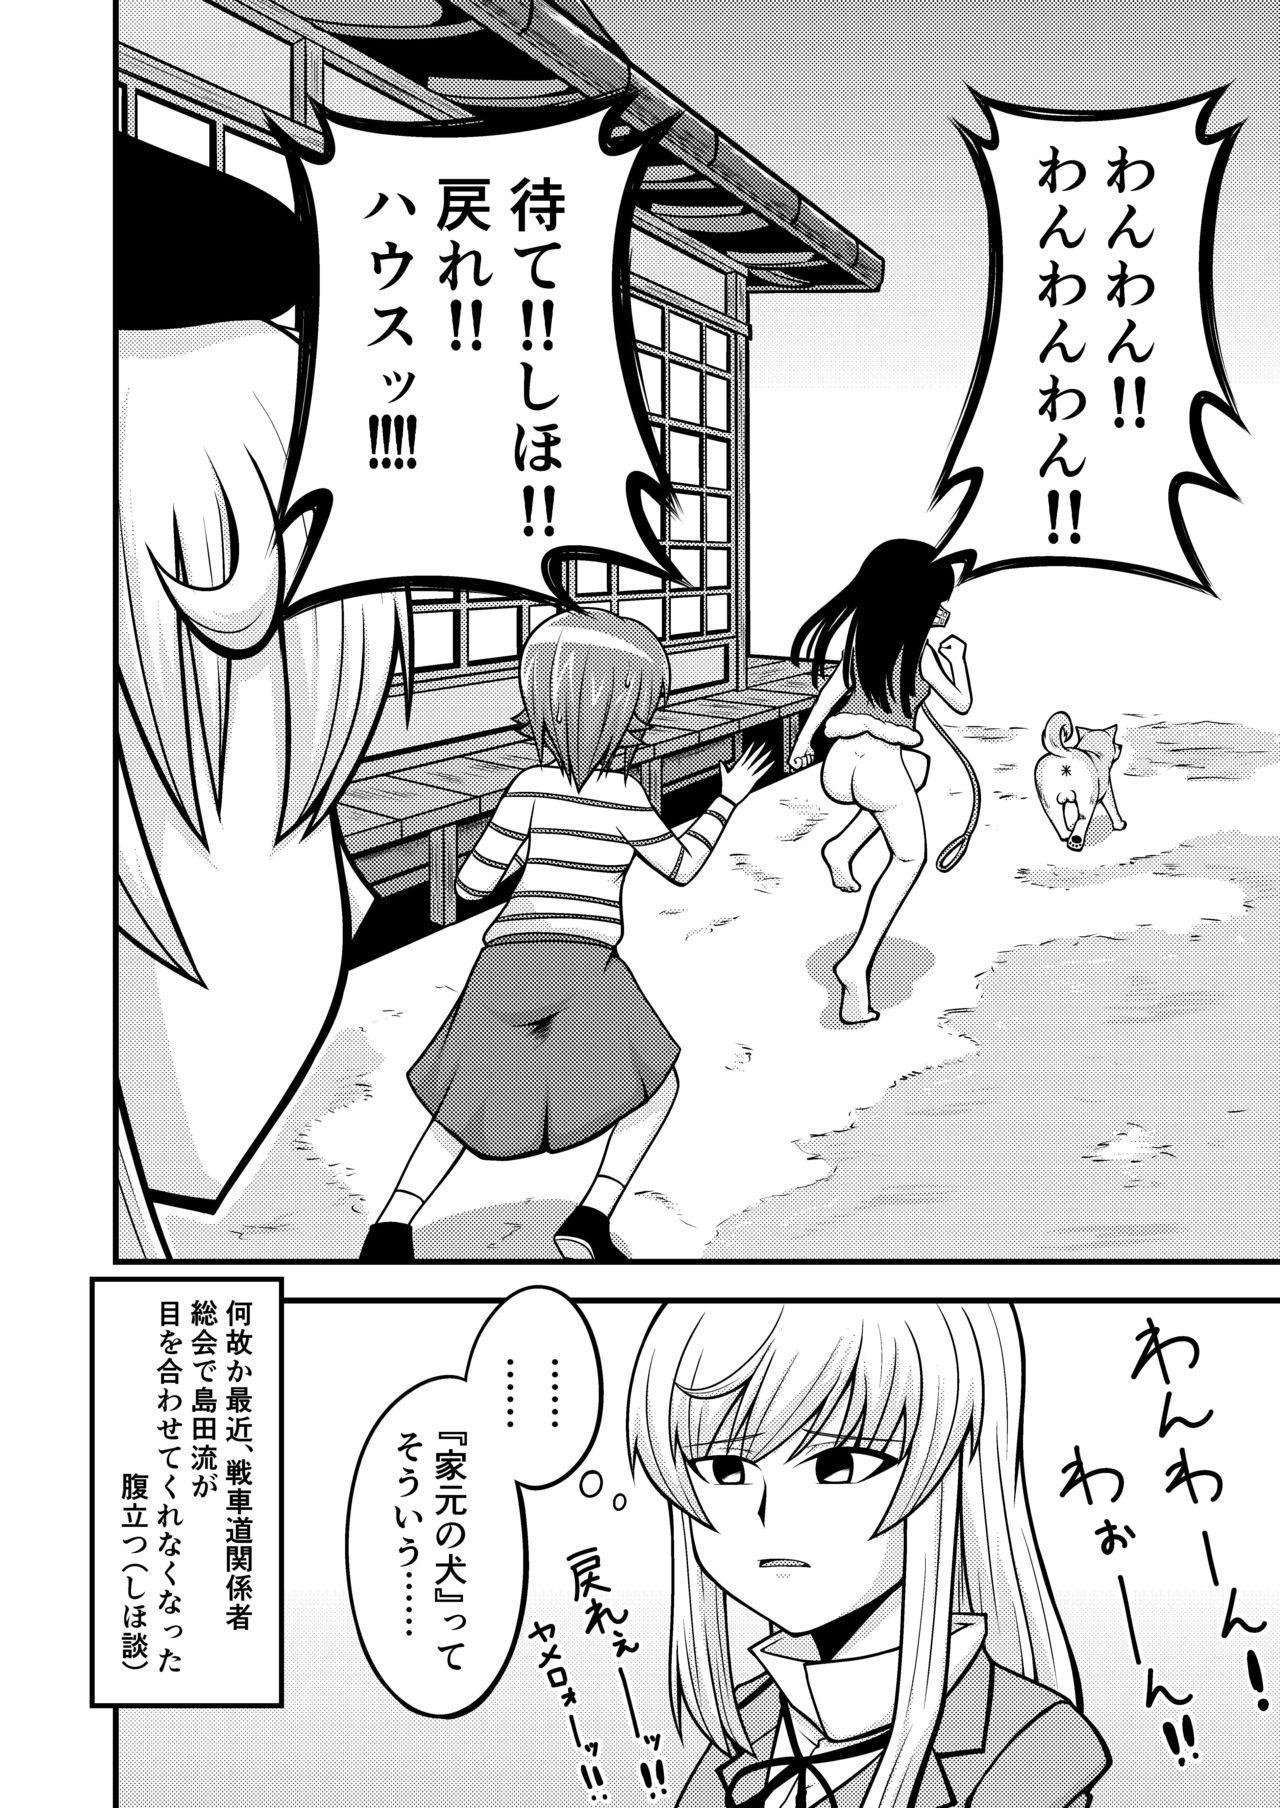 Garupan Iemoto Manga 『Iemoto no Inu』 7